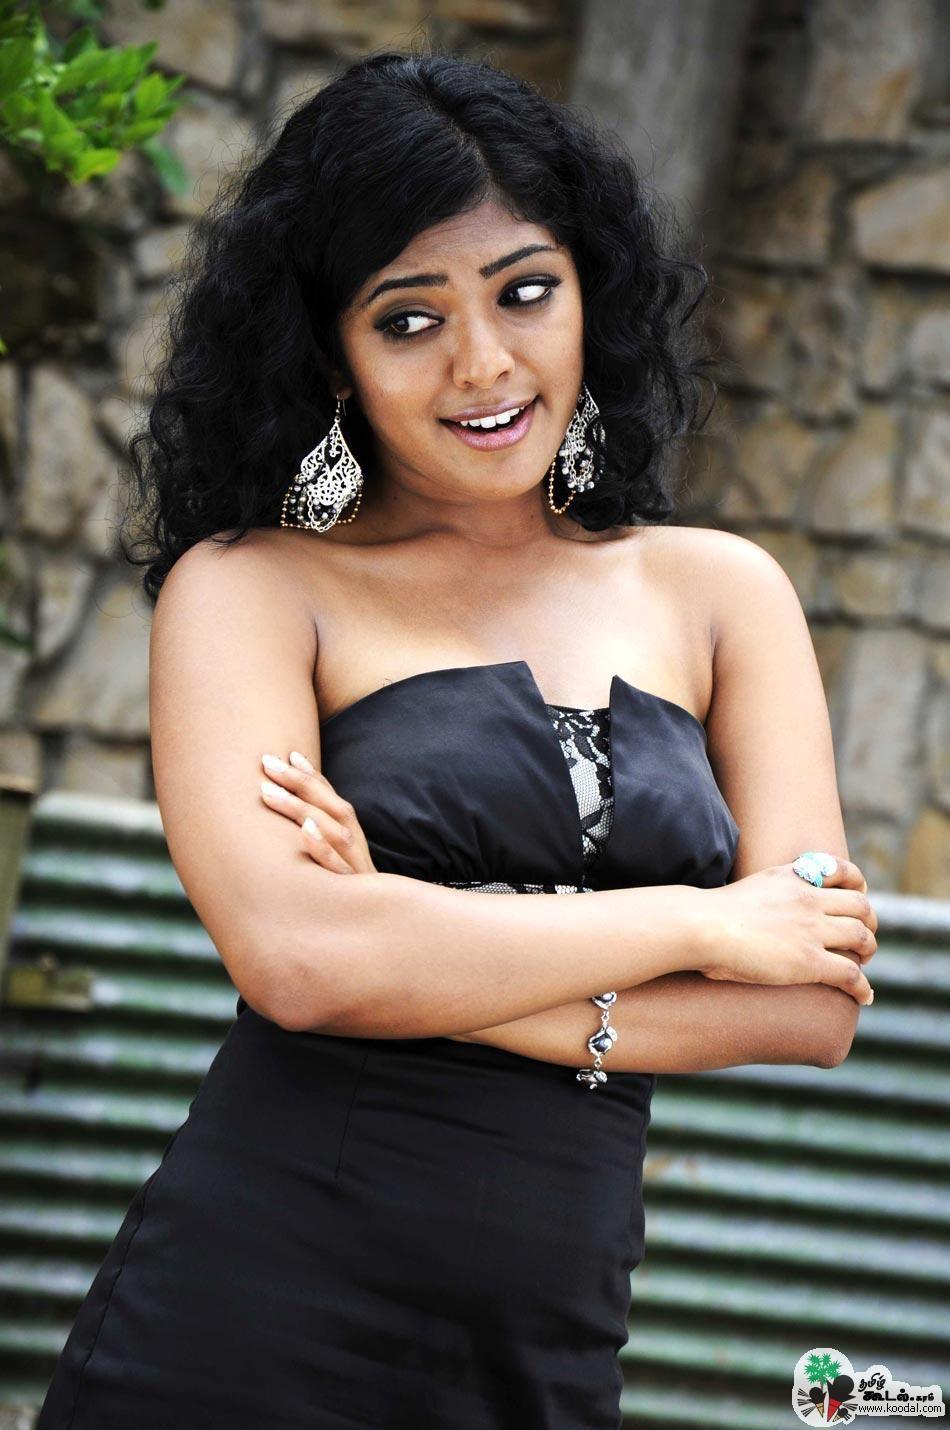 Reema Kallingal Hot Stills Reema Kallingal Hot Pics Reema Kallingal Hot Hot Reema